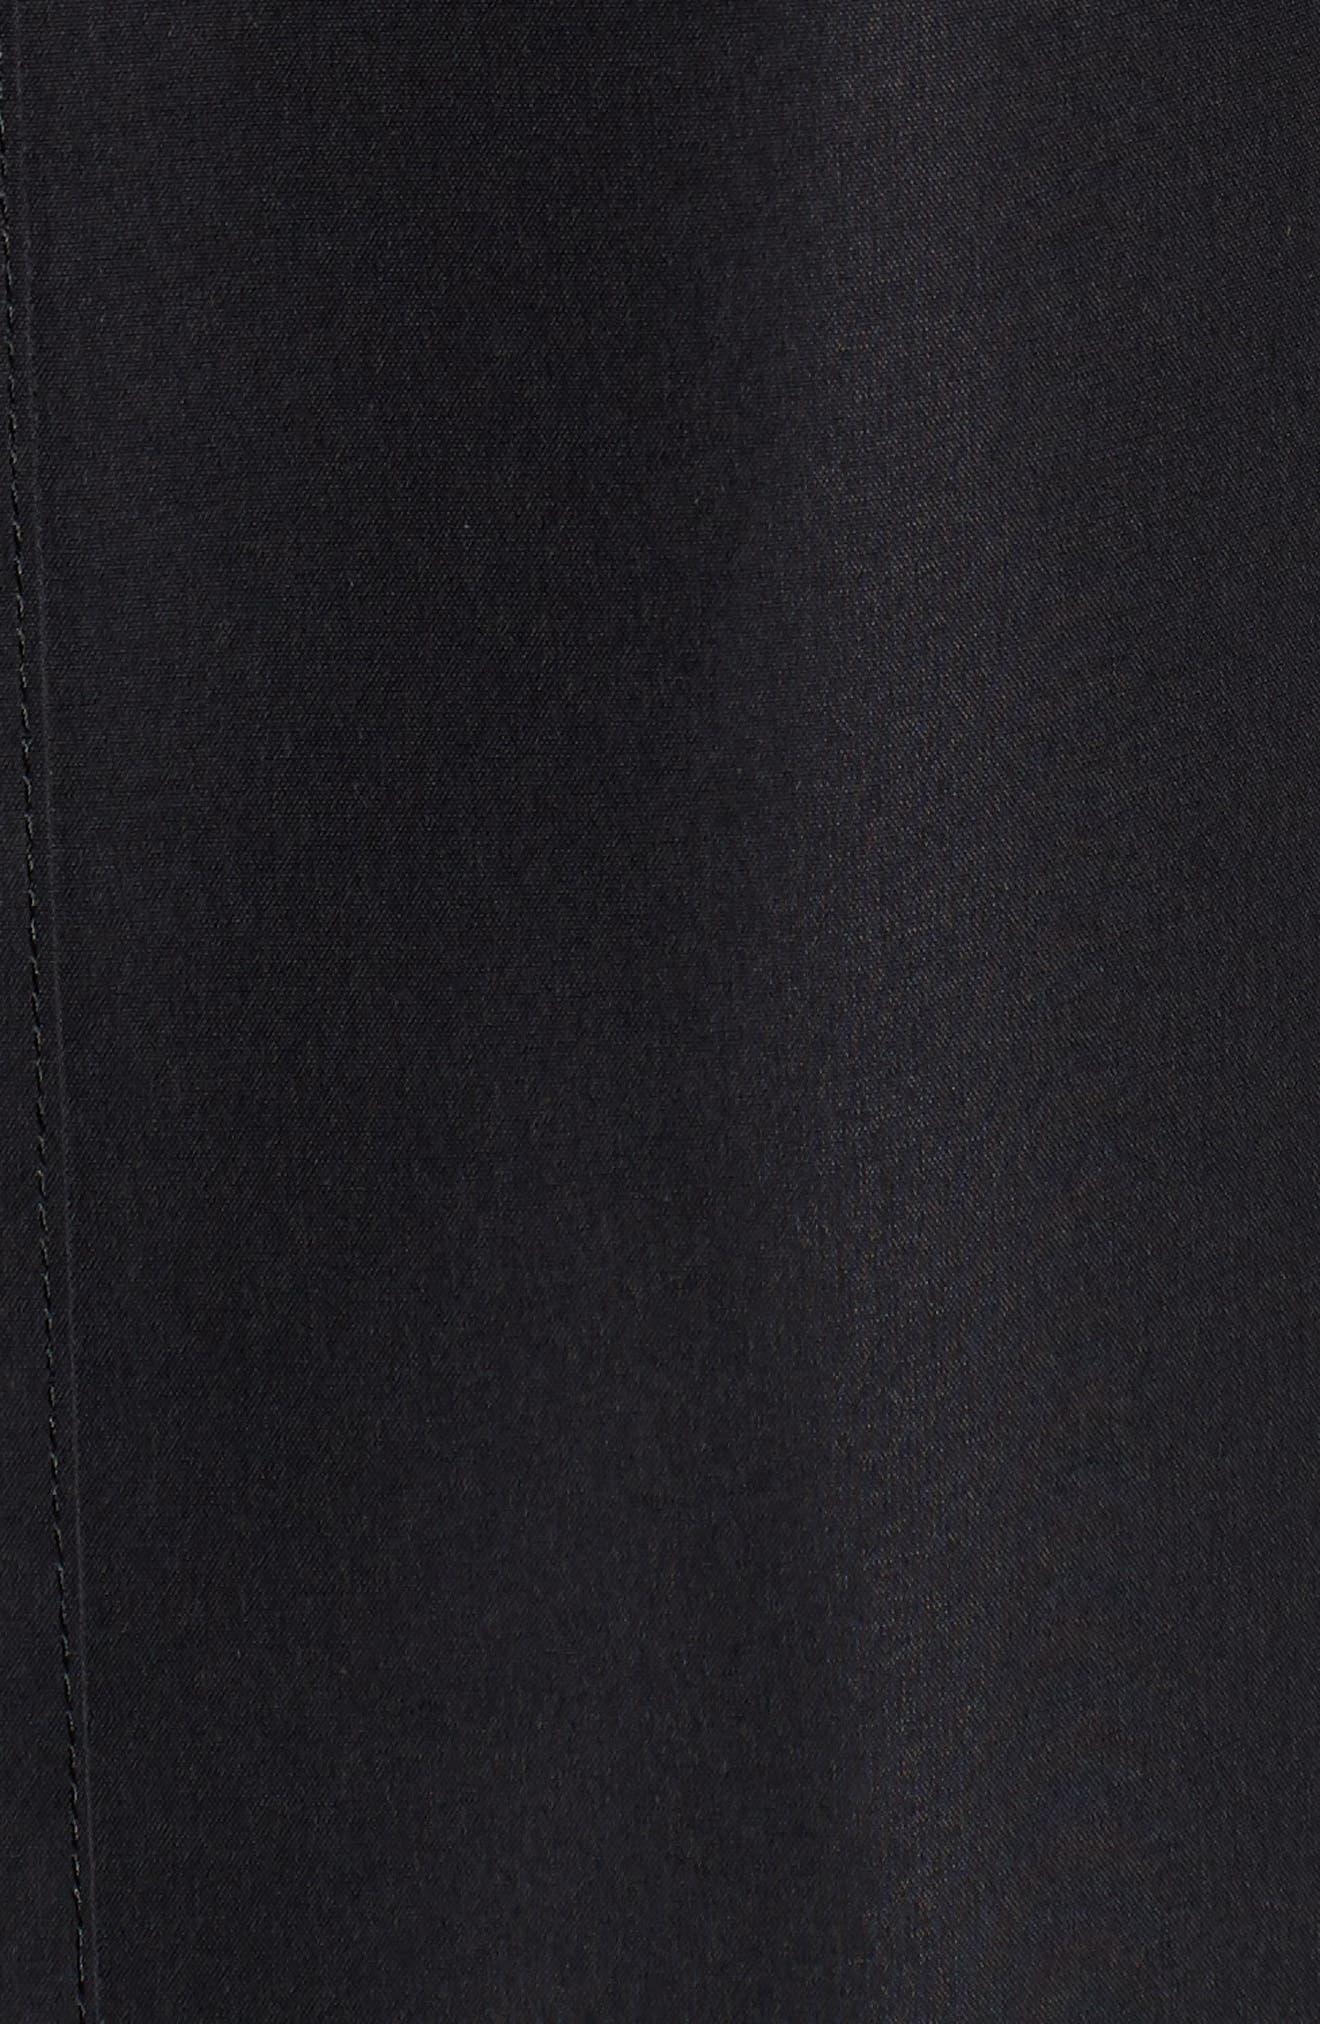 Ducasse Raincoat,                             Alternate thumbnail 6, color,                             BLACK